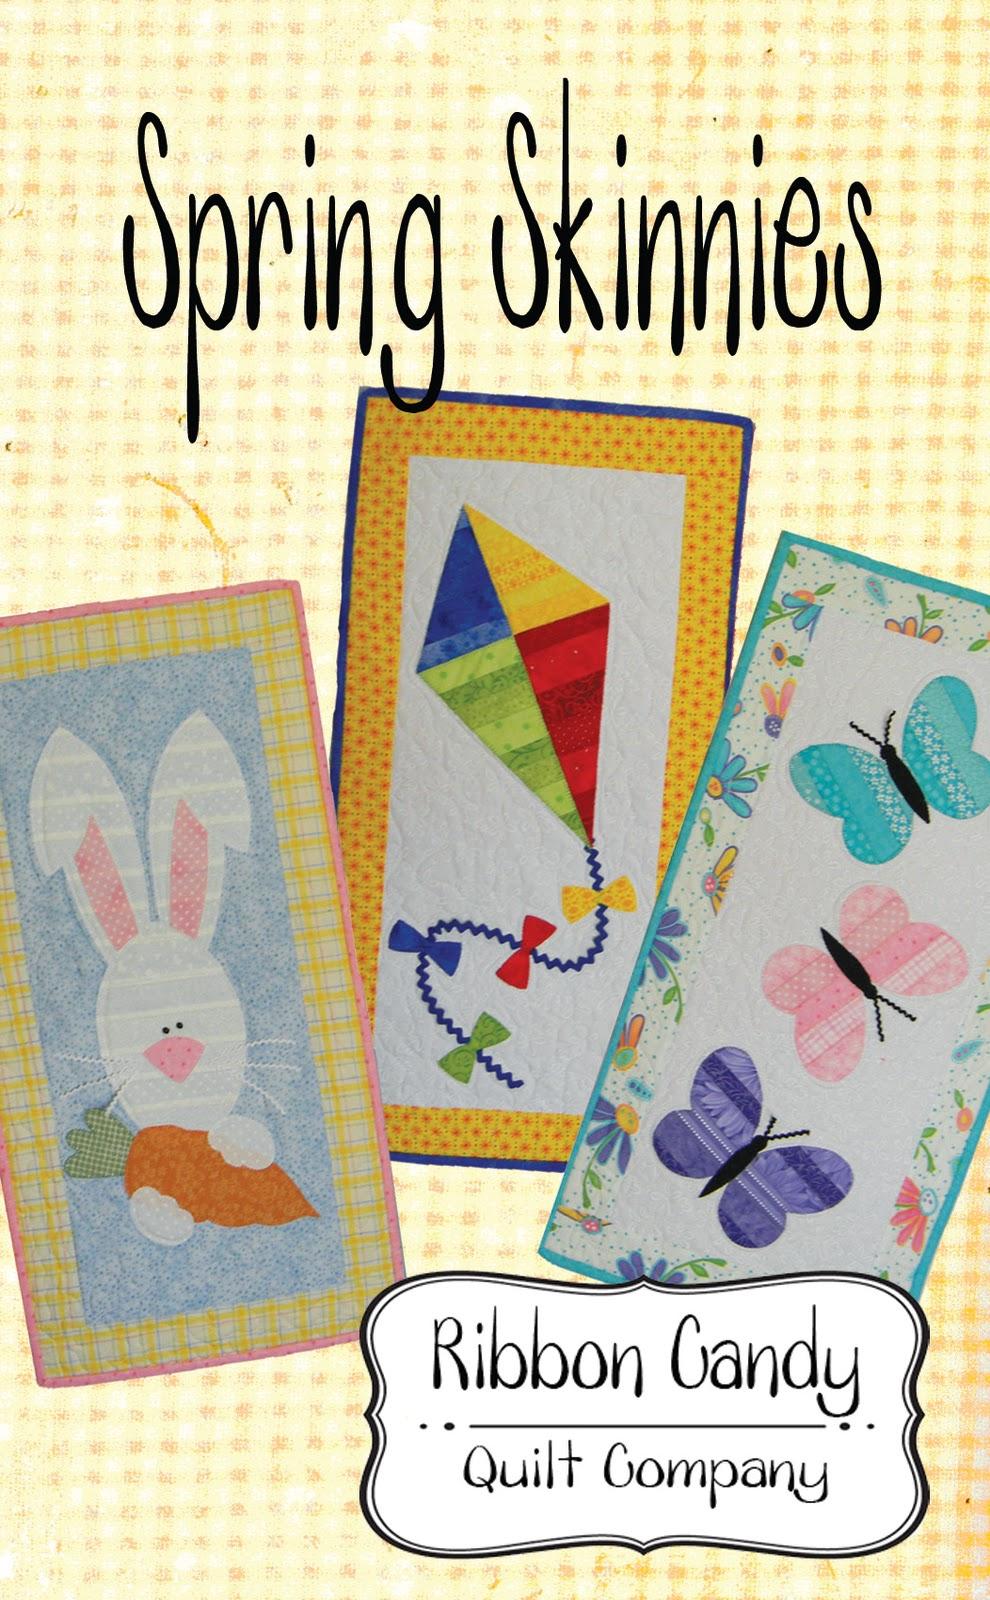 Ribbon Candy Quilt Company Seasonal Skinnies Patterns